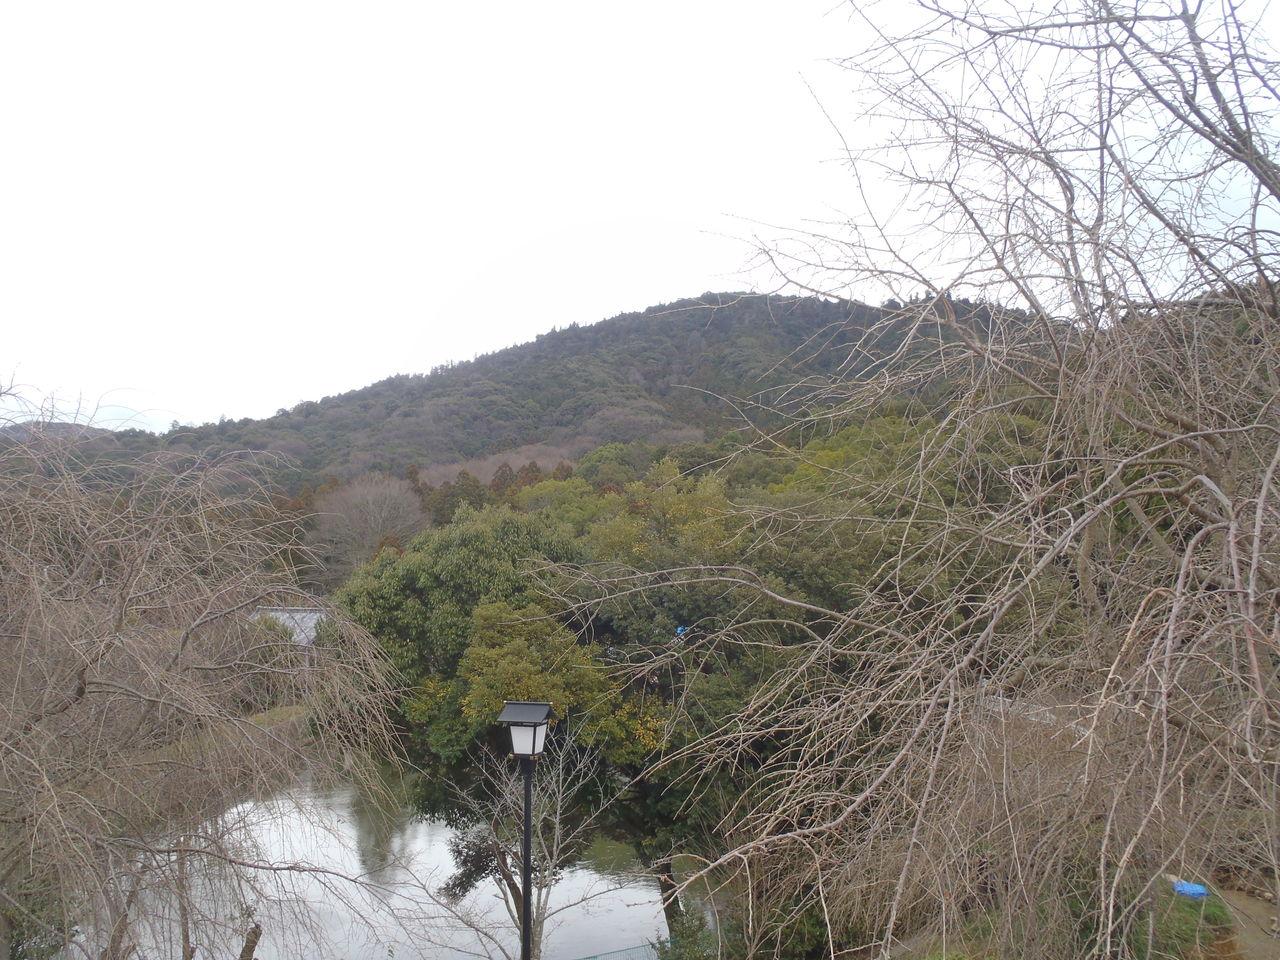 日本一時帰国充電の旅 粉雪舞う京都、奈良編